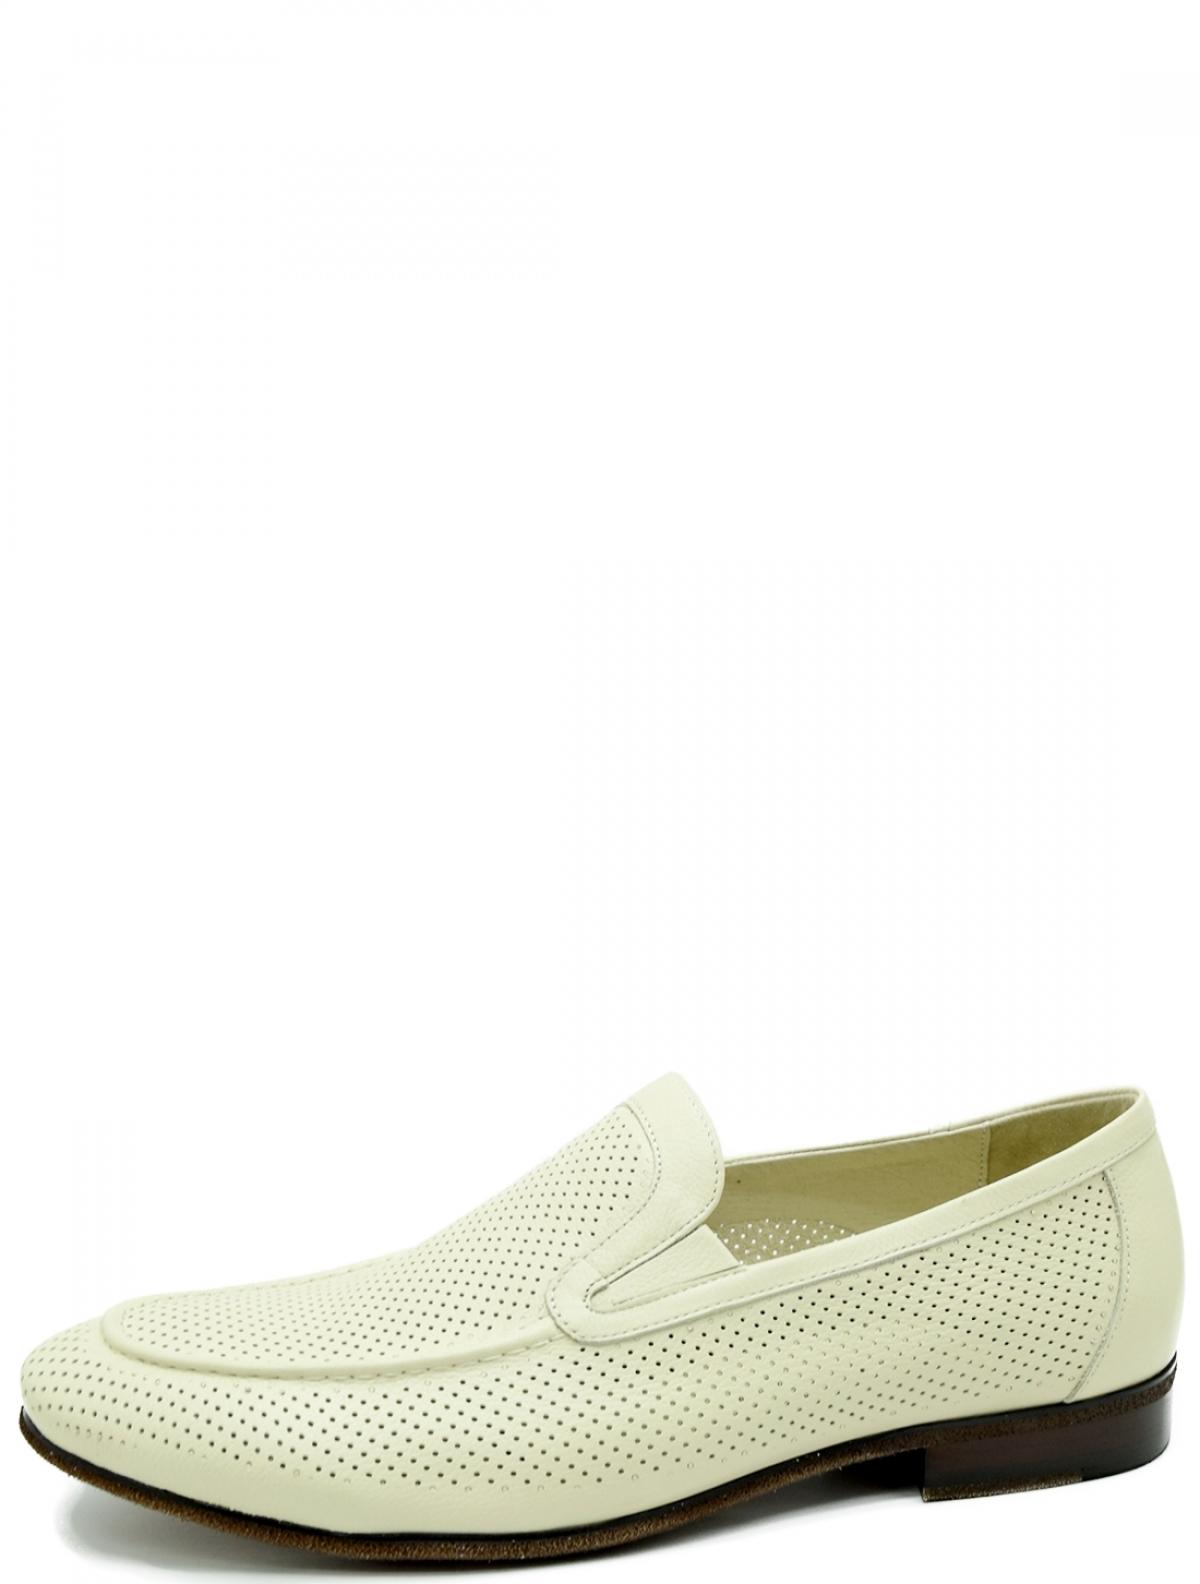 Rosconi R483B35YC-217-6575C мужские туфли